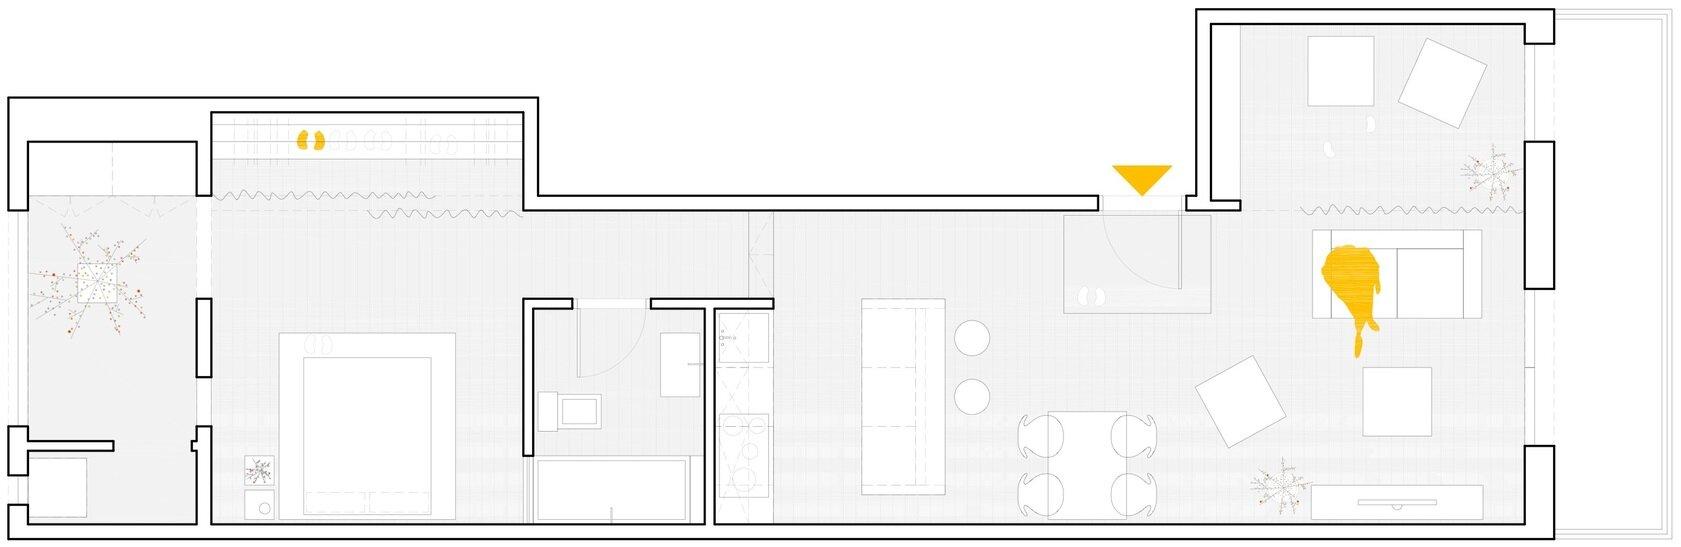 Les Corts - Apartment Renovation - Sergi Pons - Barcelona - Spain - Floor Plan - Humble Homes